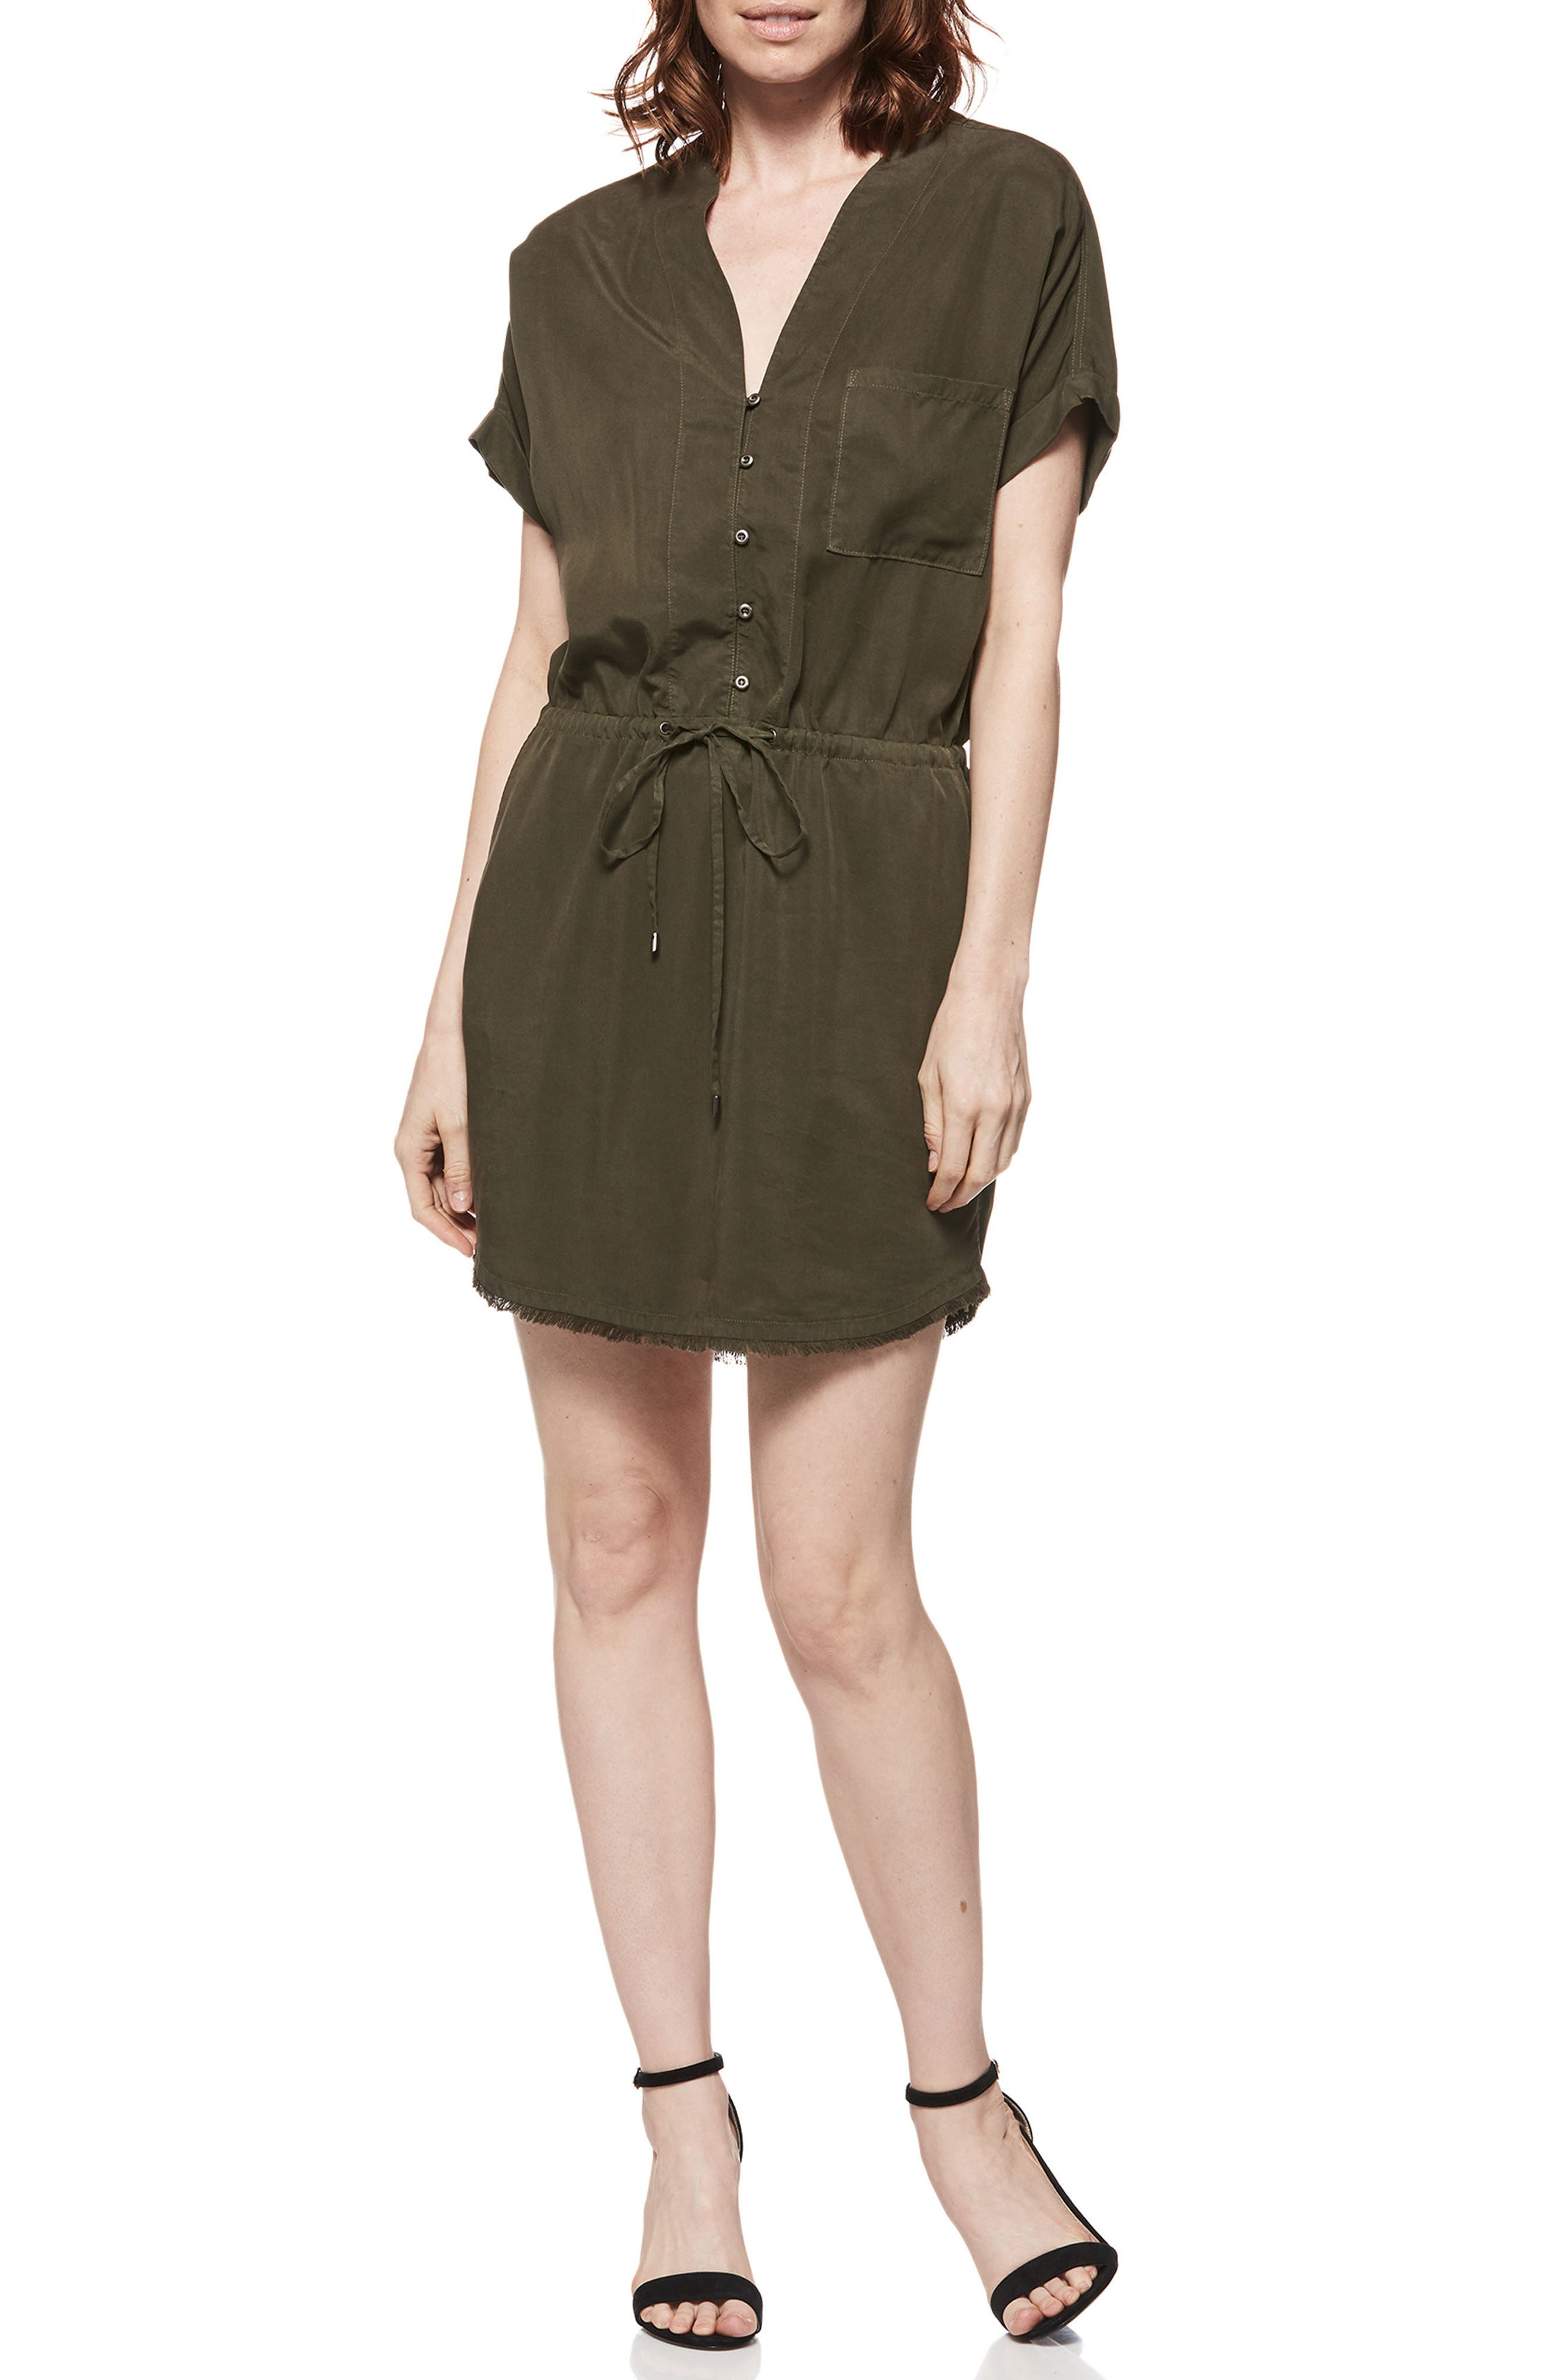 PAIGE Haidee Dress, Main, color, 301